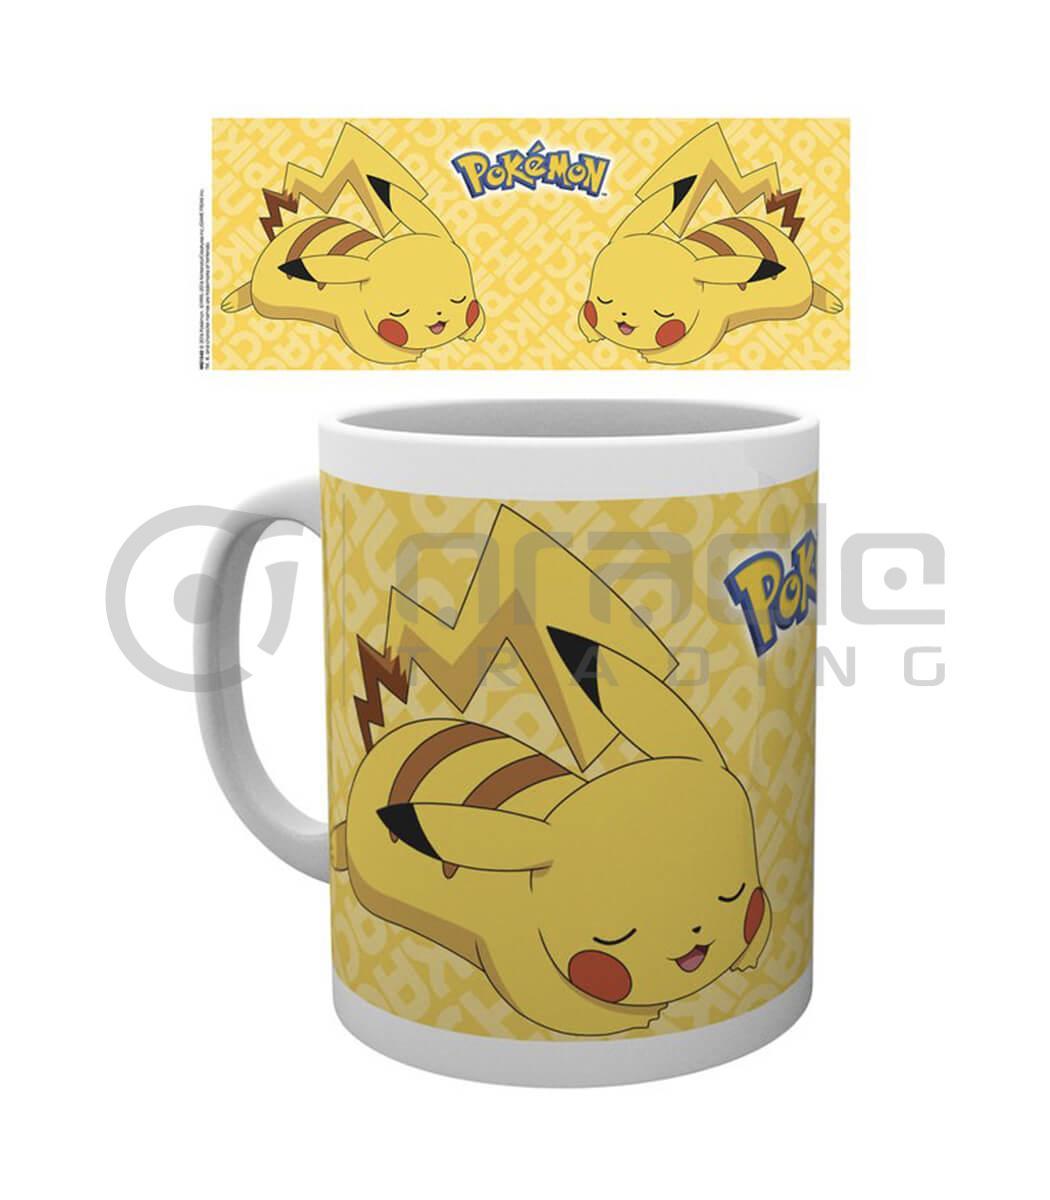 Pokémon Mug - Pikachu - Rest